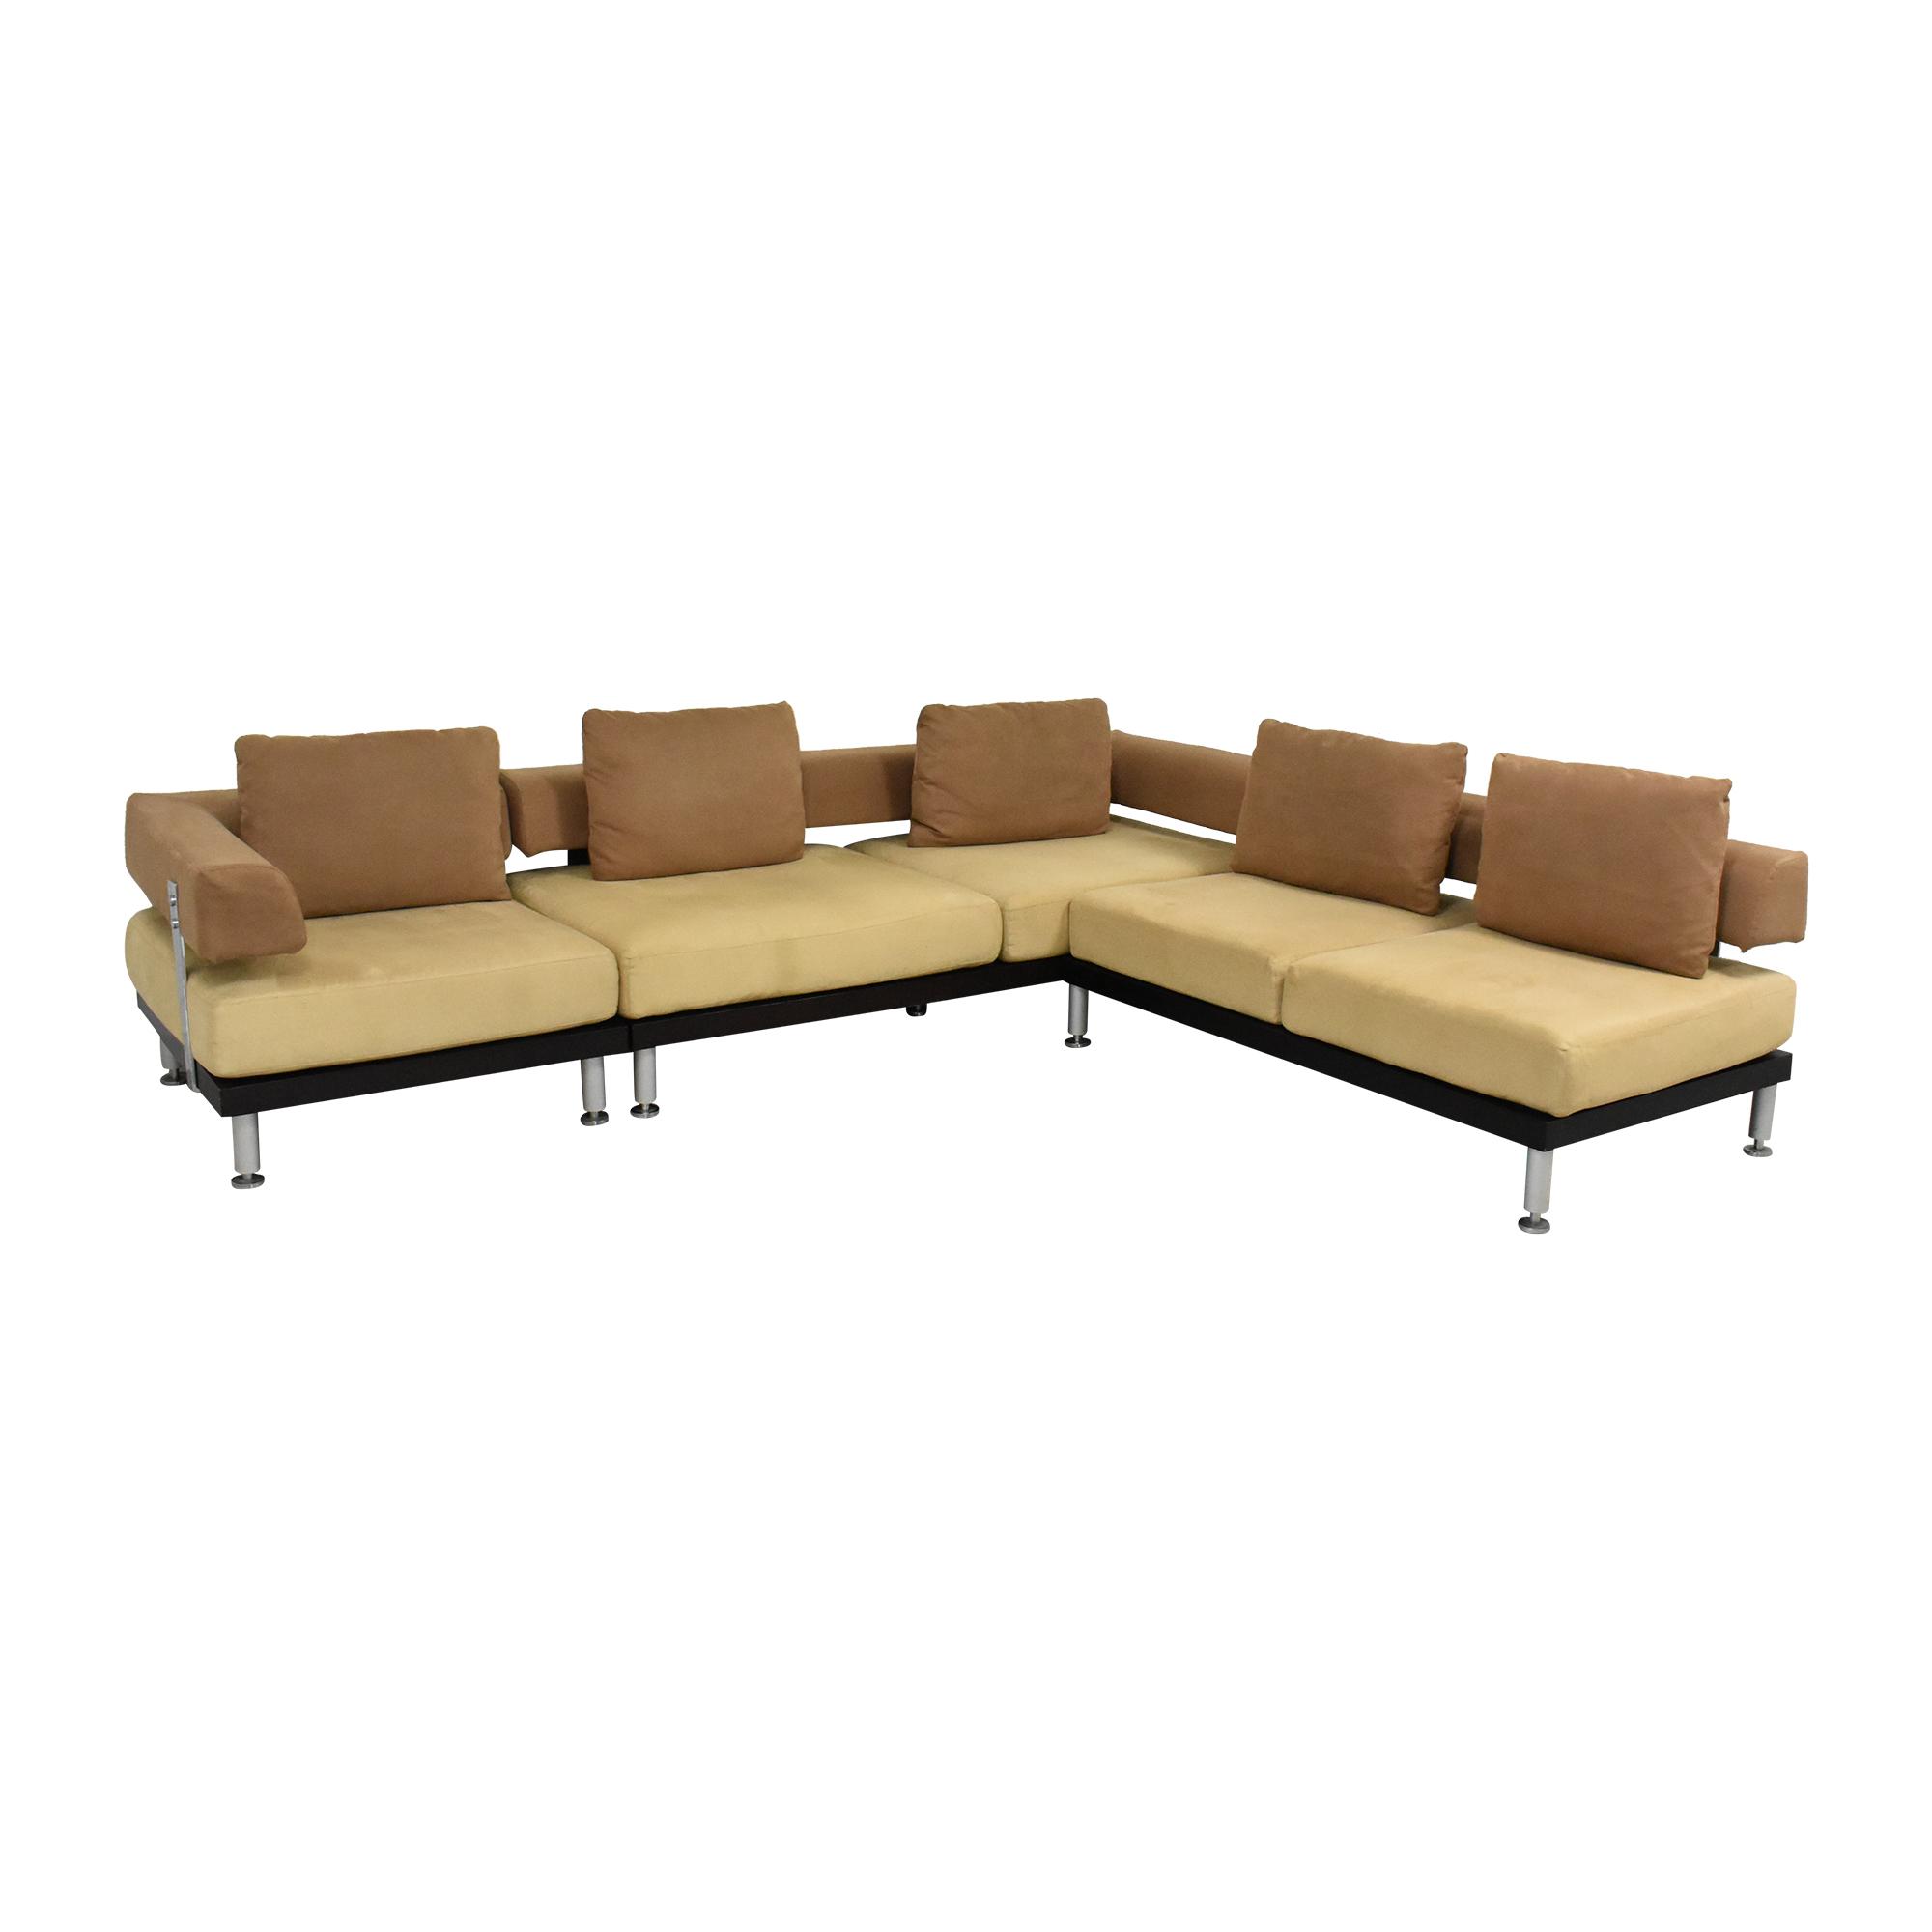 Modern L Shaped Sectional Sofa